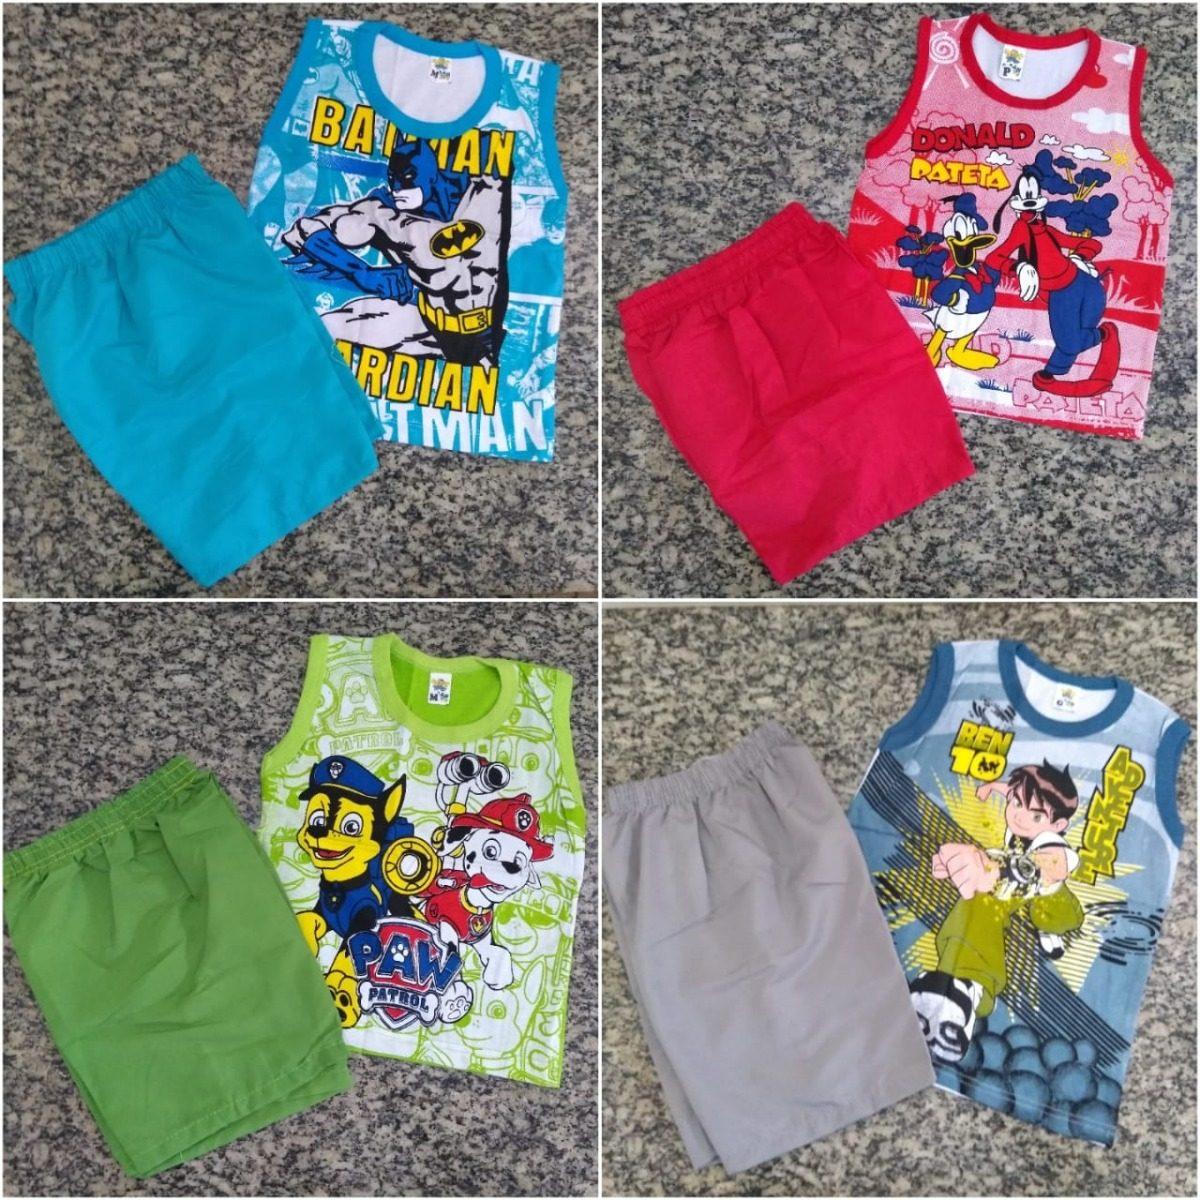 a1aeb37d6 moda infantil kit 6 conjuntos meninos roupa personagens. Carregando zoom.